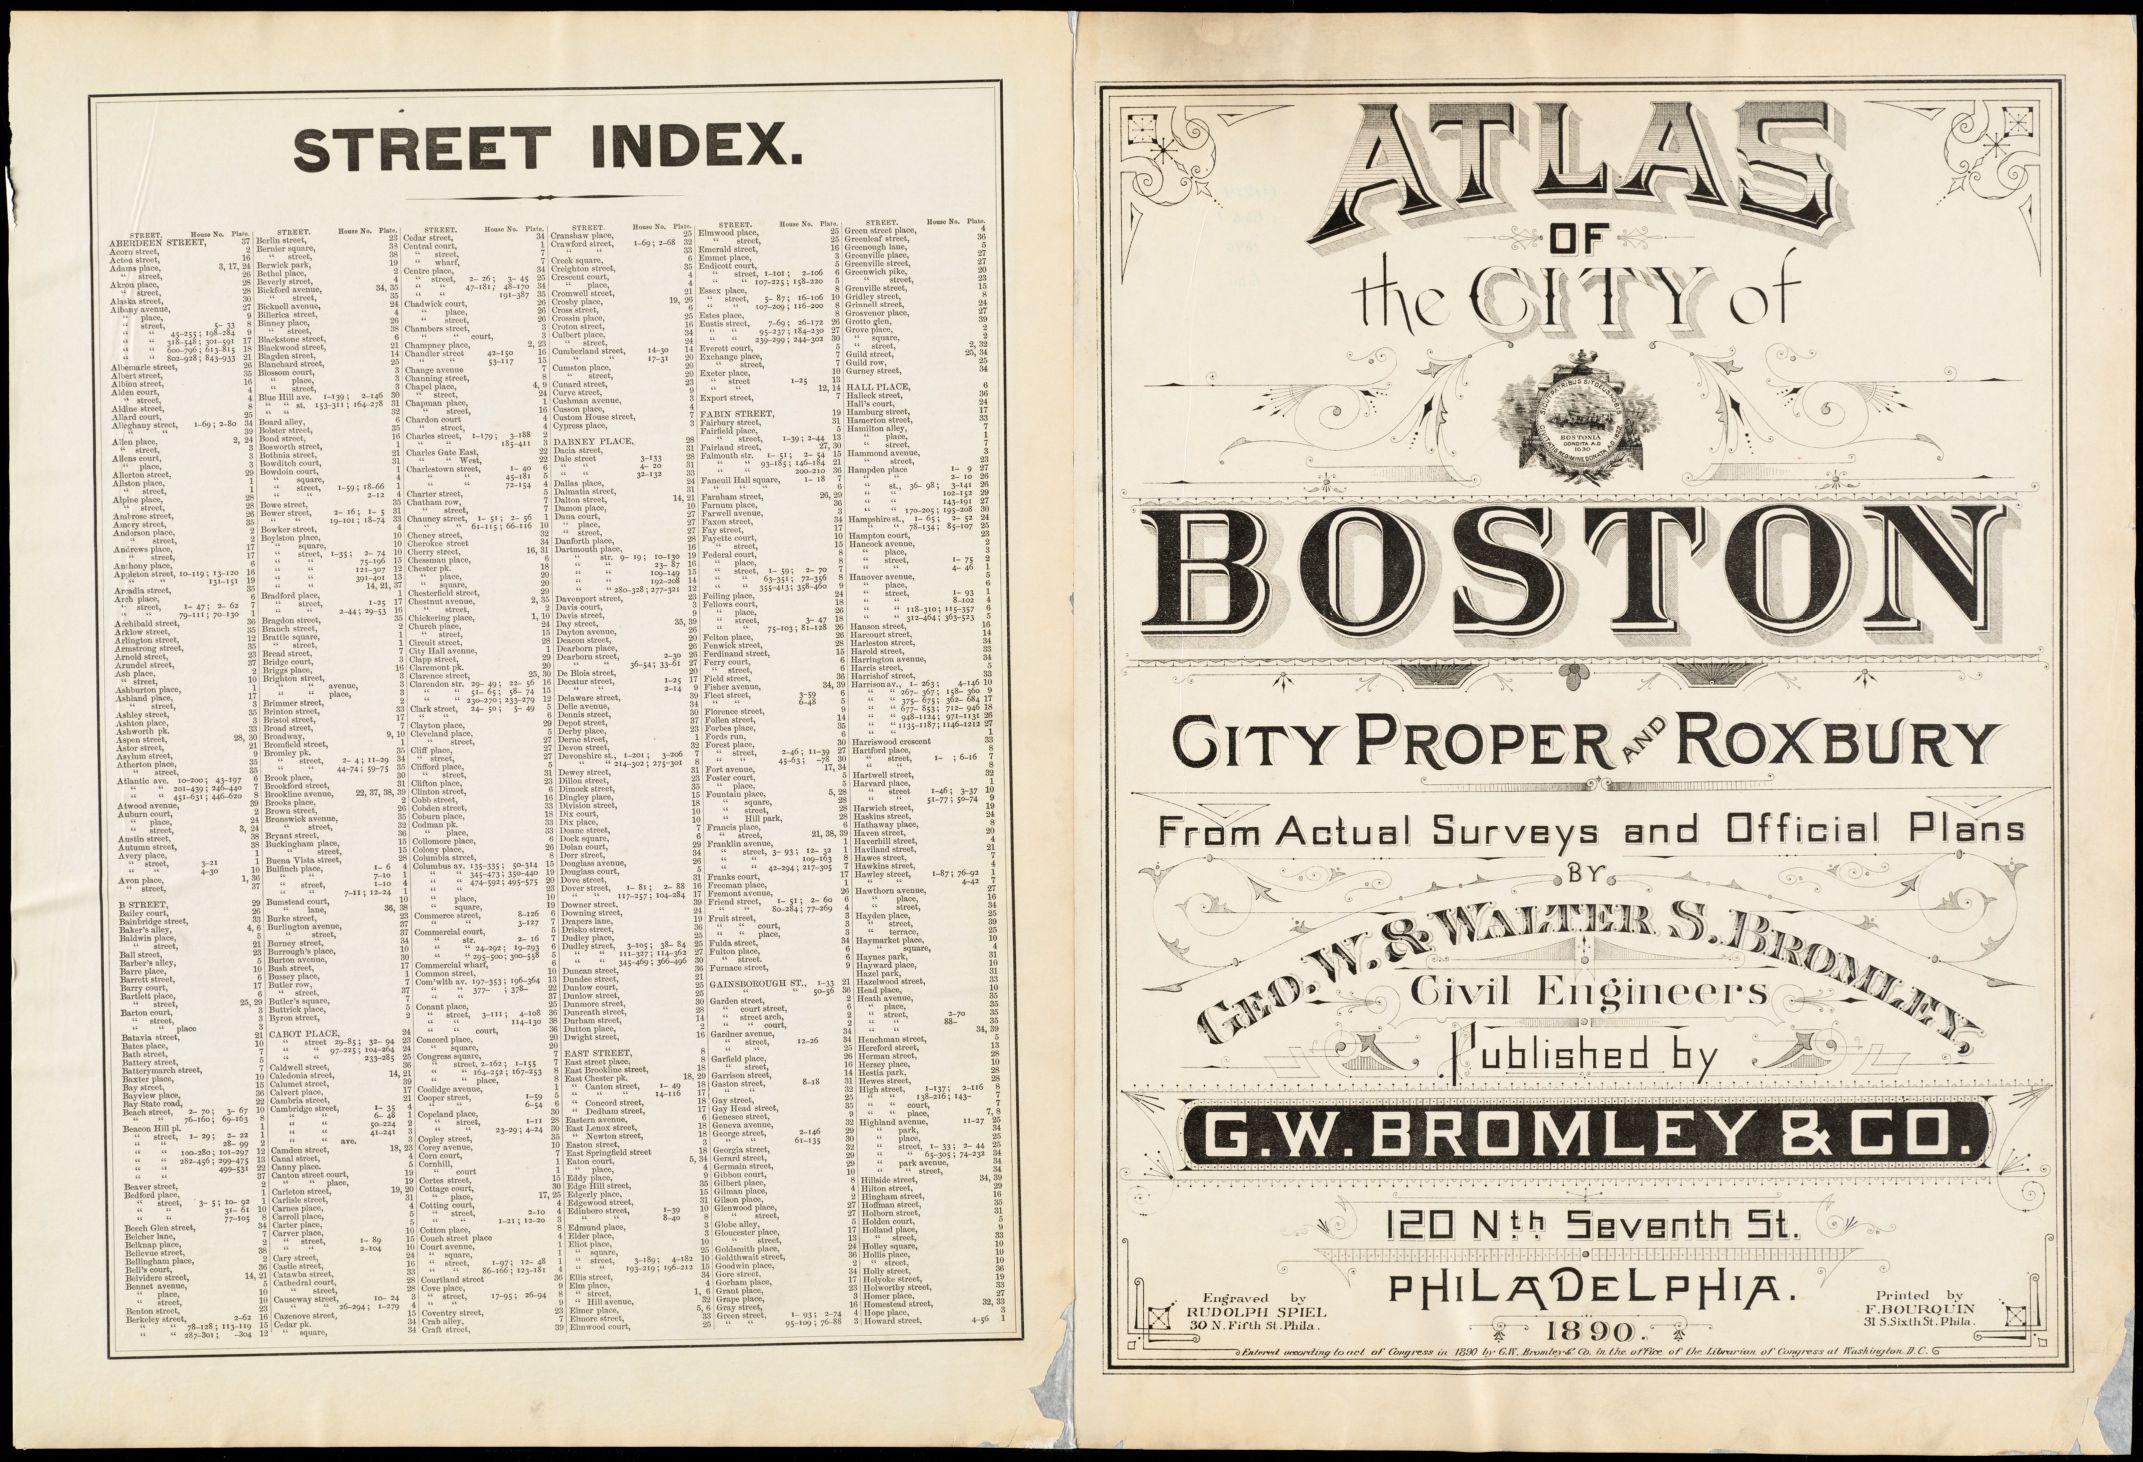 Atlas of the city of Boston : city proper and Roxbury